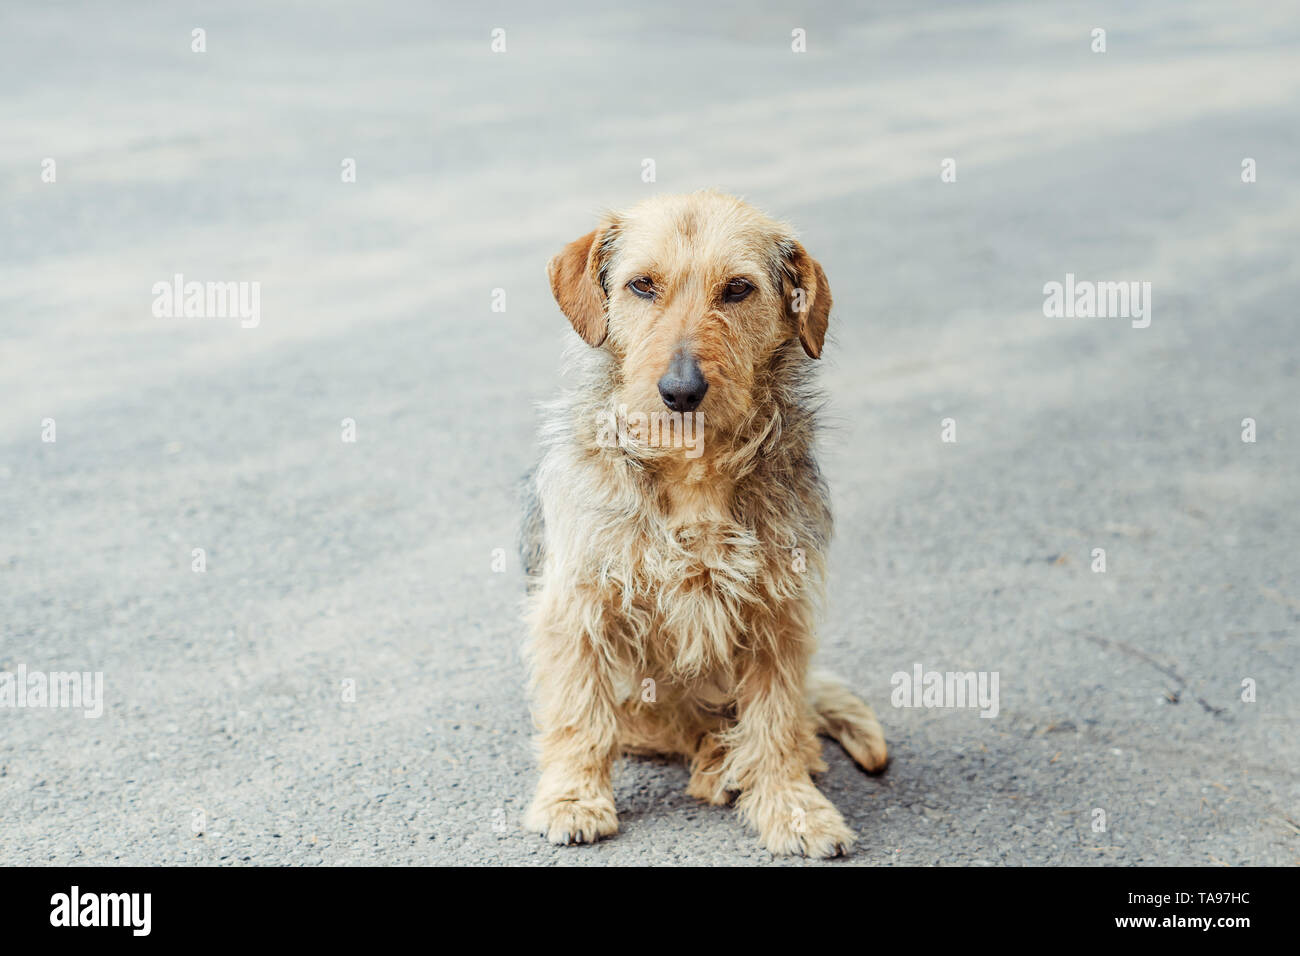 shaggy dog sitting on the pavement sad - Stock Image